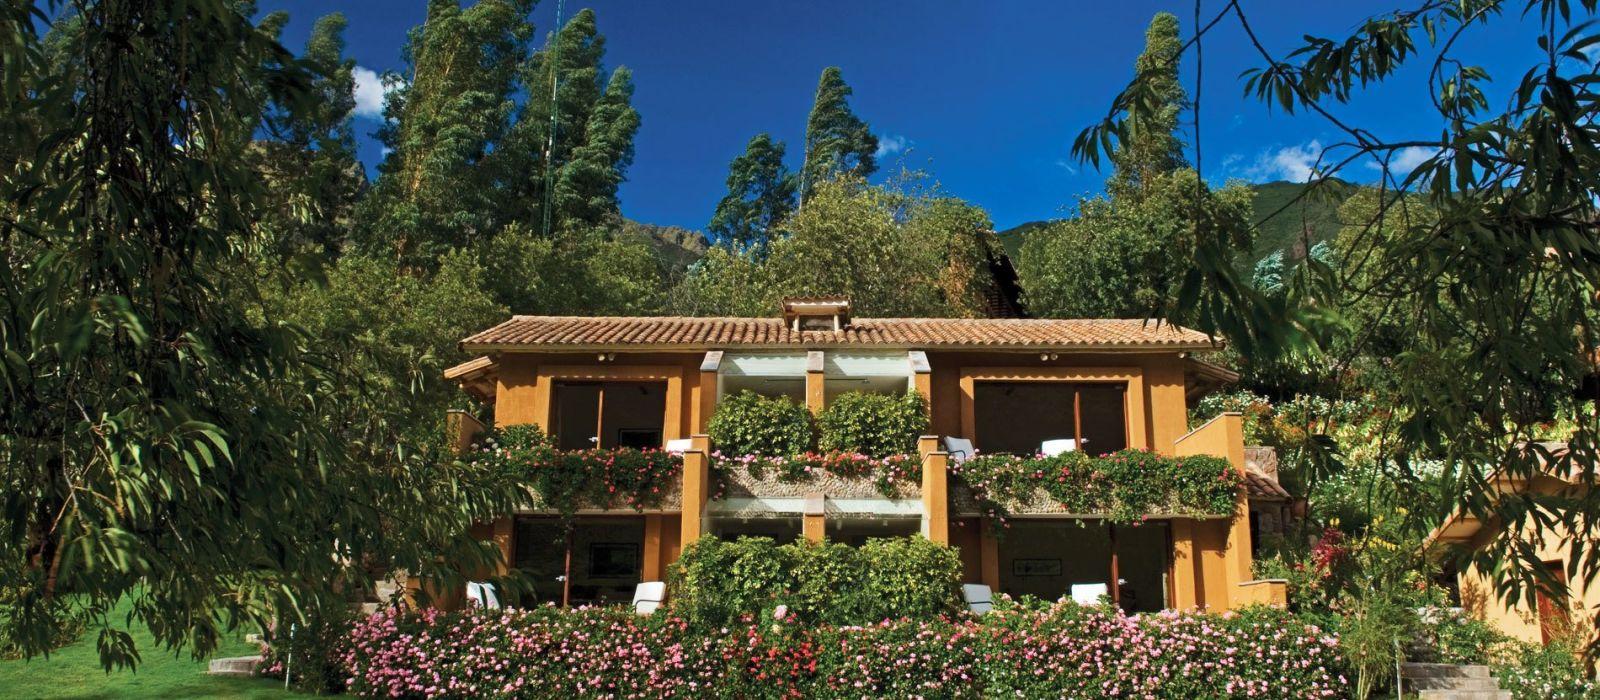 Hotel Belmond Rio Sagrado Peru